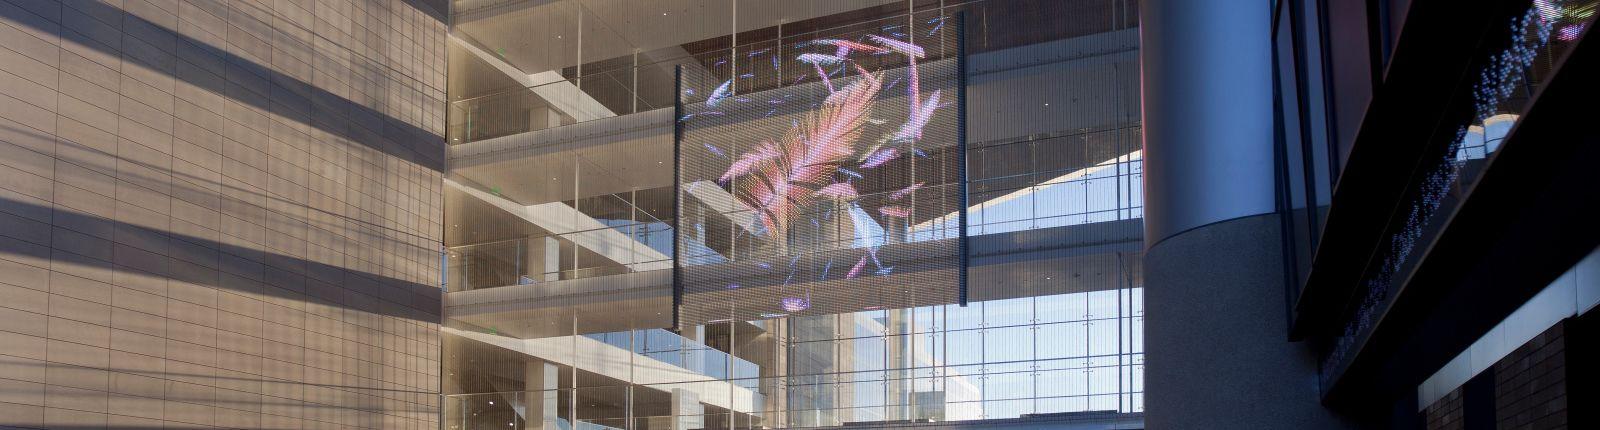 Transparent media façade in the Long Beach Court Building